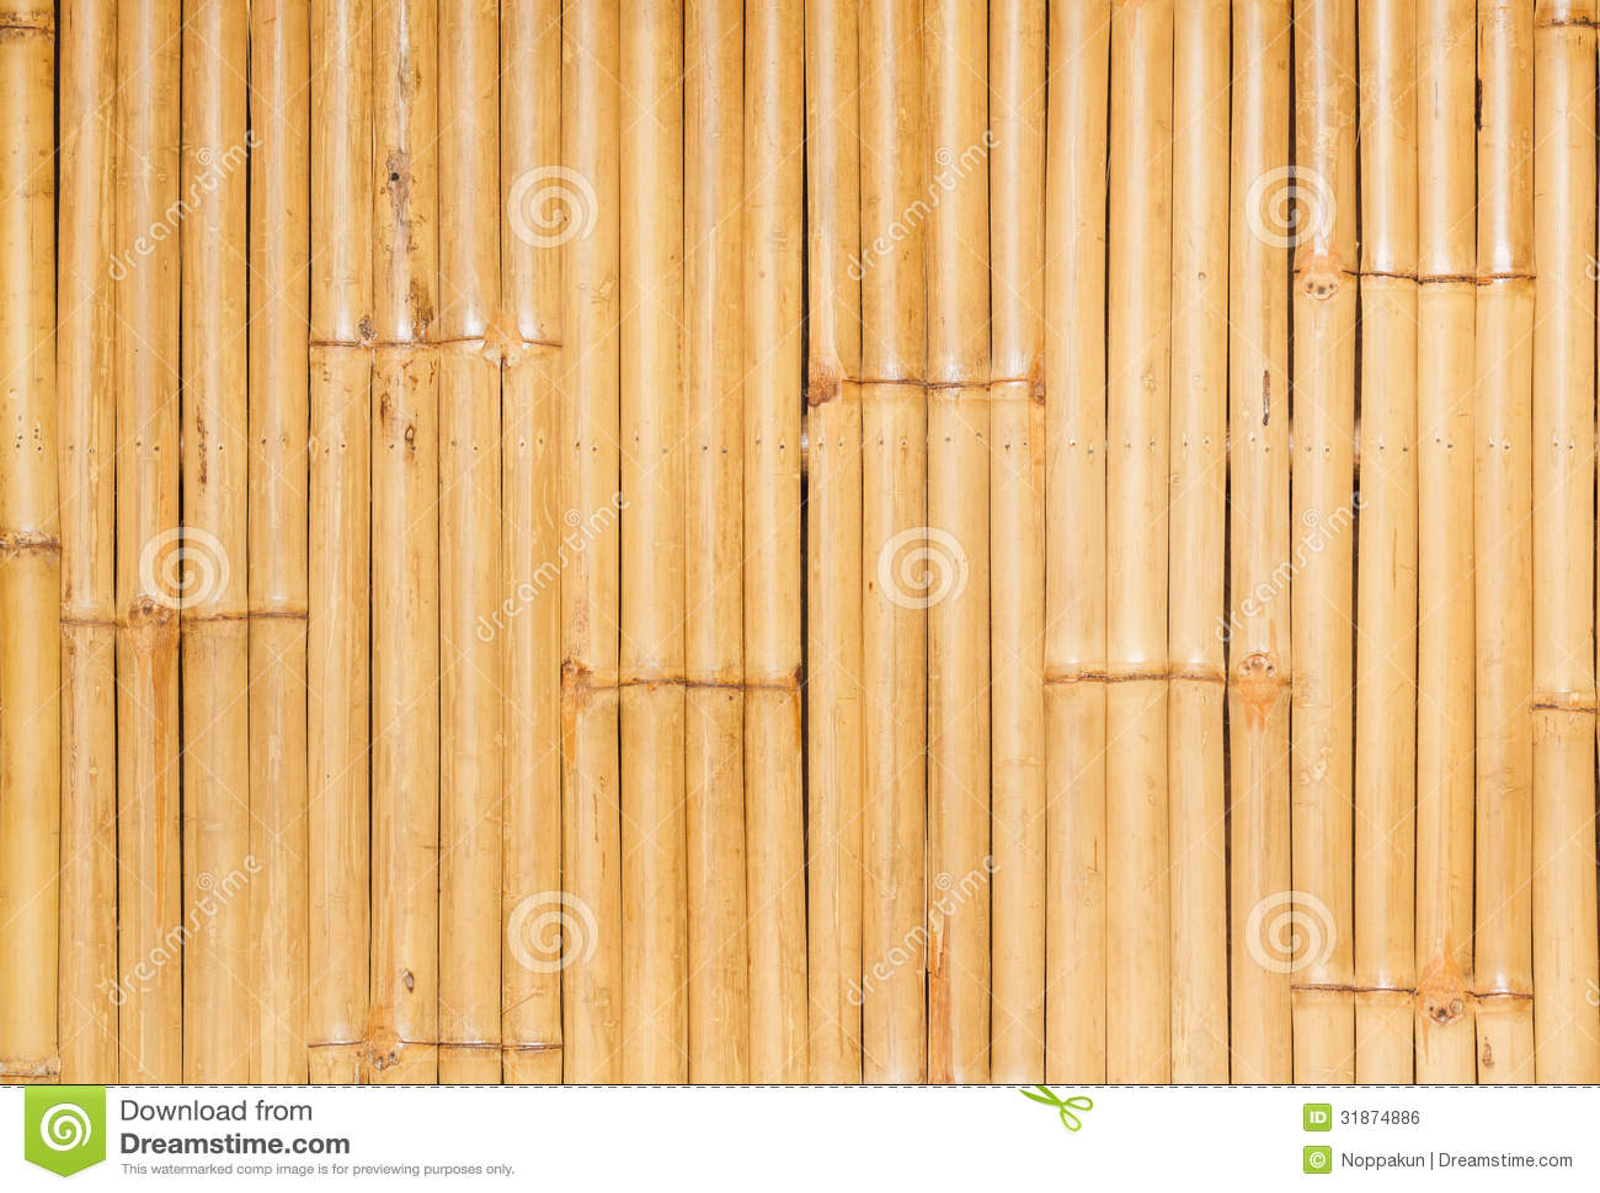 Bamboo wall background stock photo. Image of decoration - 31874886